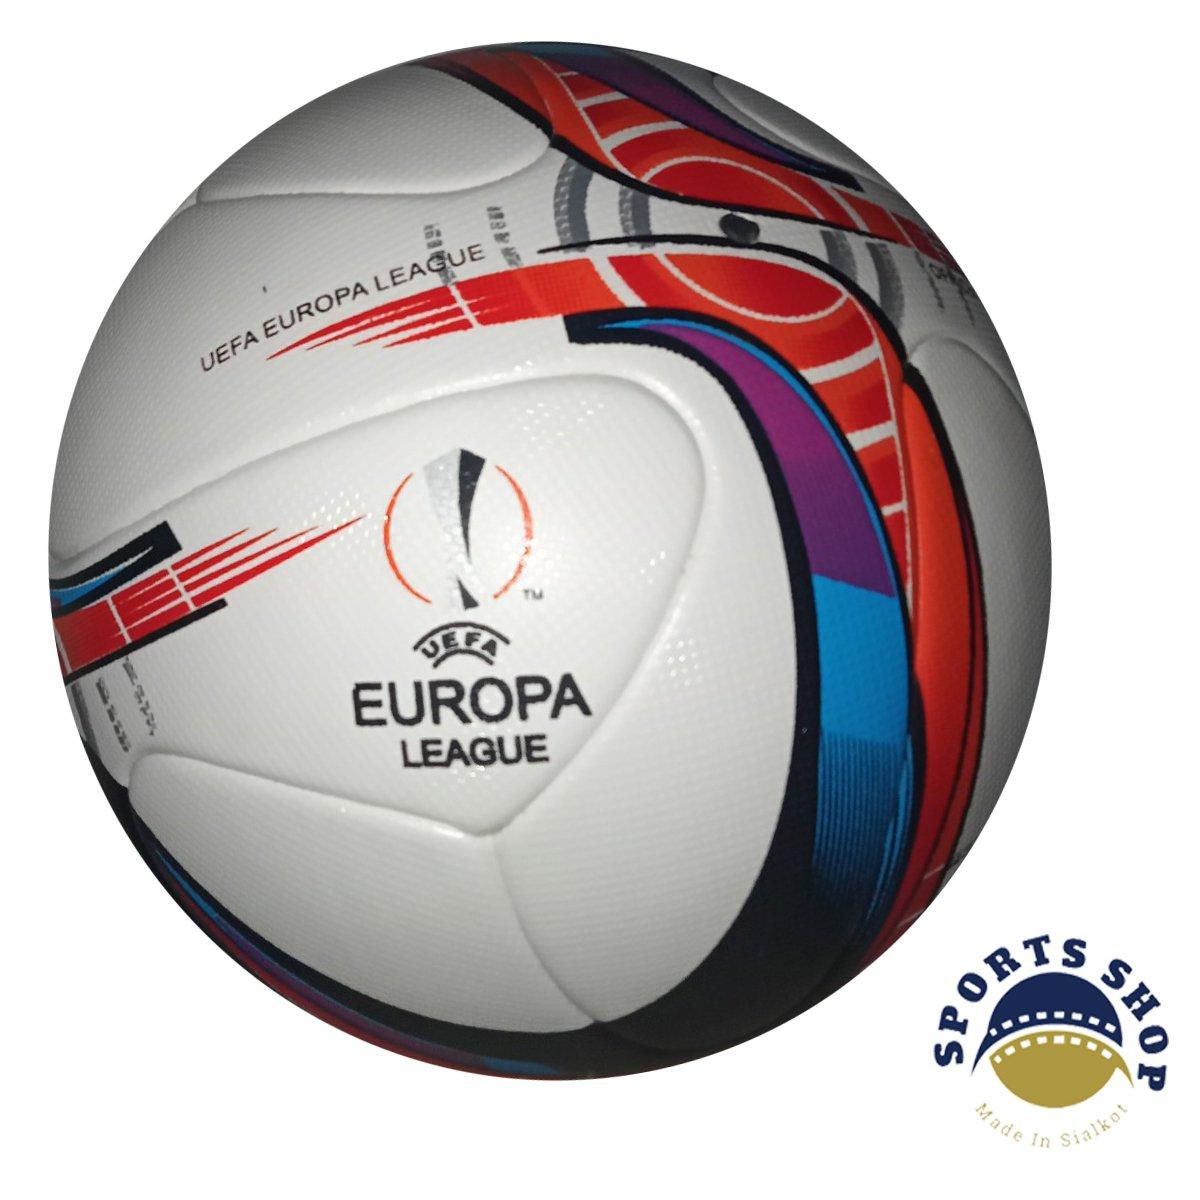 Adidas UEFA EUROPA LEAGUE Soccer Match Ball of 2017 size 5 Free Shipping